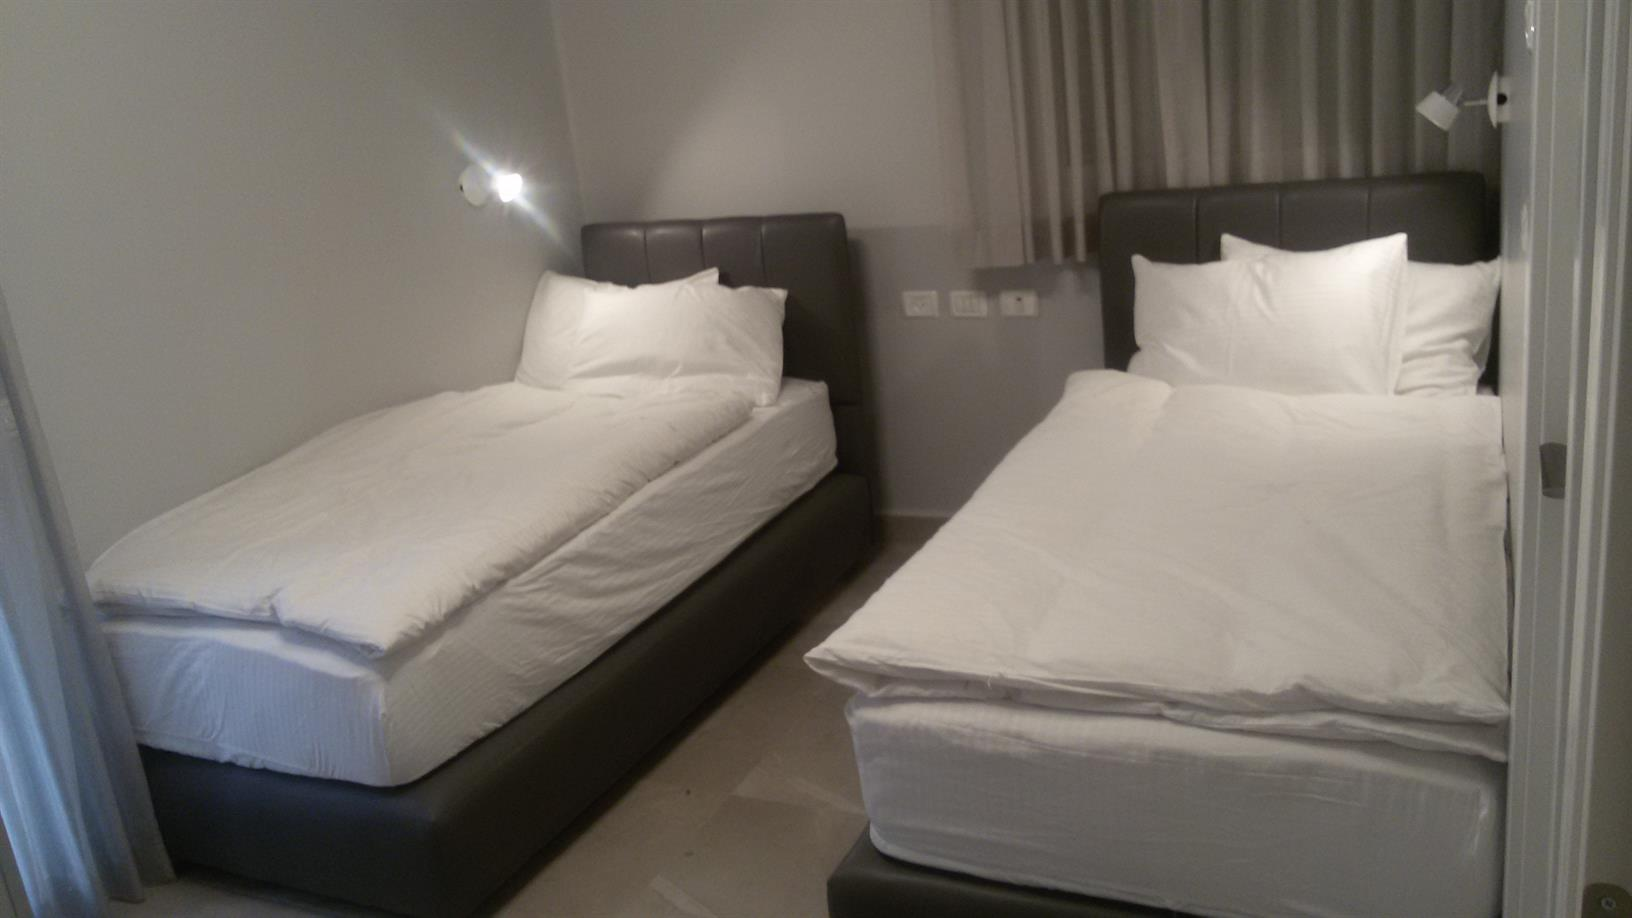 Israel Fresh Clean New Spacious Great 1 Bedroom Apartment On Ground Floor On Yoel S